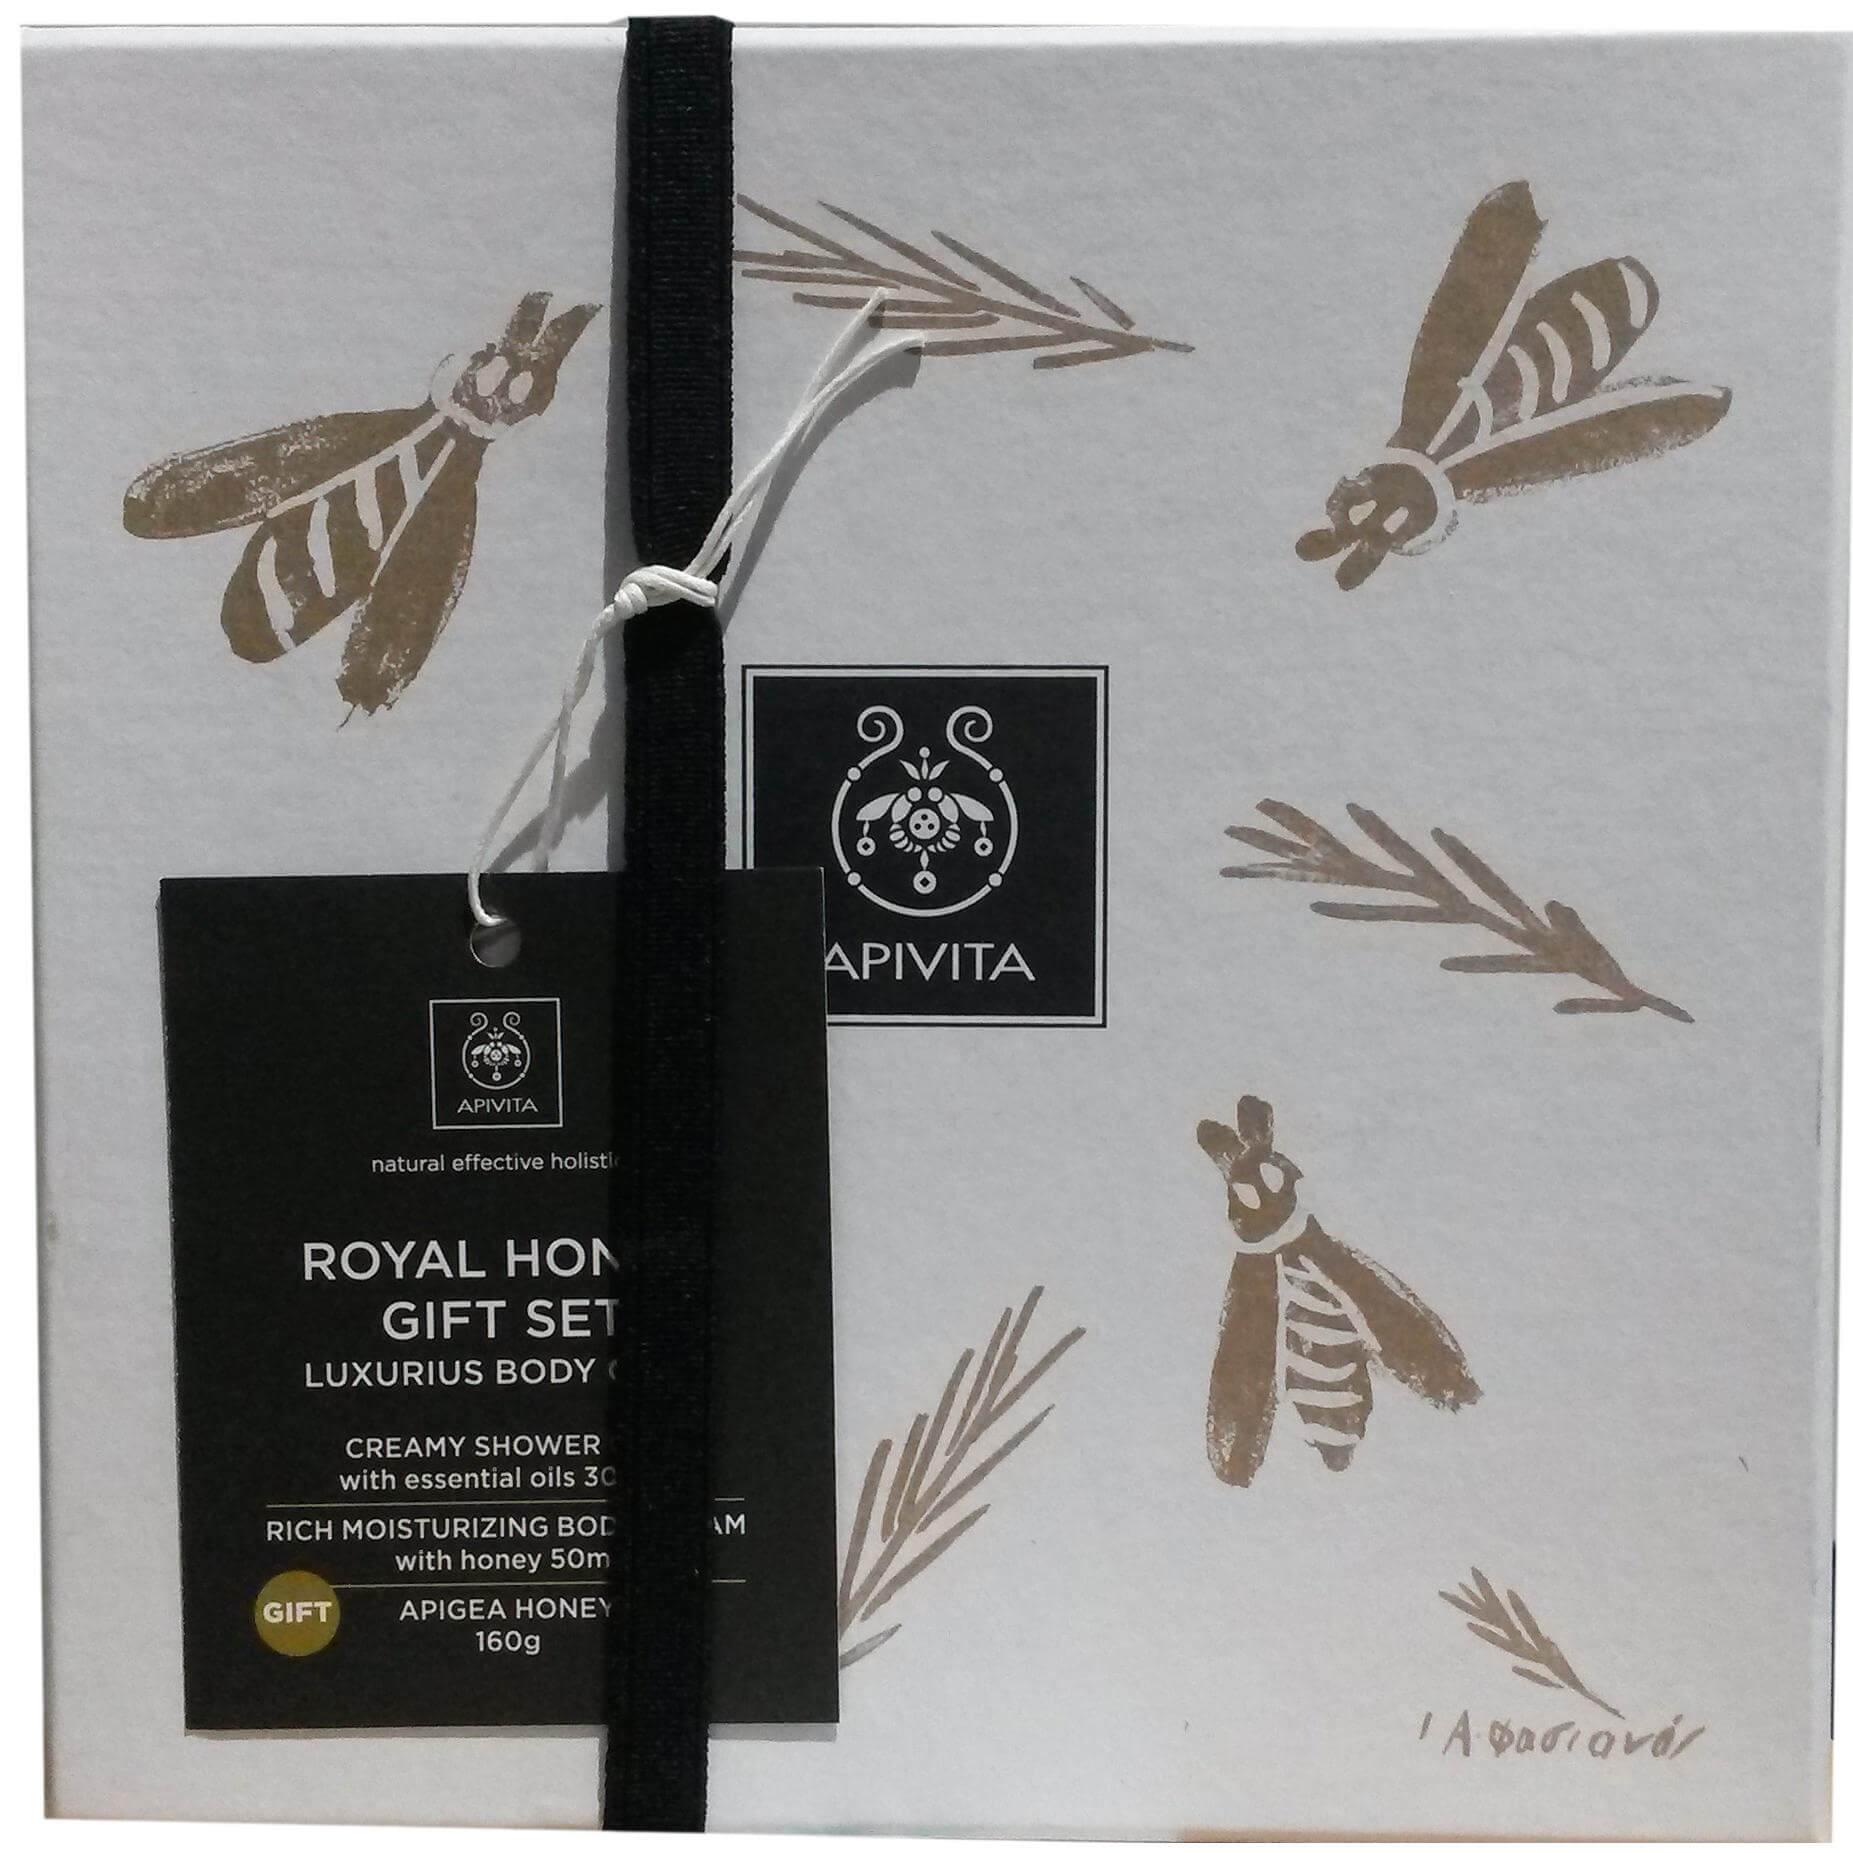 Apivita Πακέτο Προσφοράς Gift Set Royal Honey Body Cream 200ml, Royal Honey Creamy Shower Gel 300ml & Δώρο Ελληνικό Μέλι 160gr